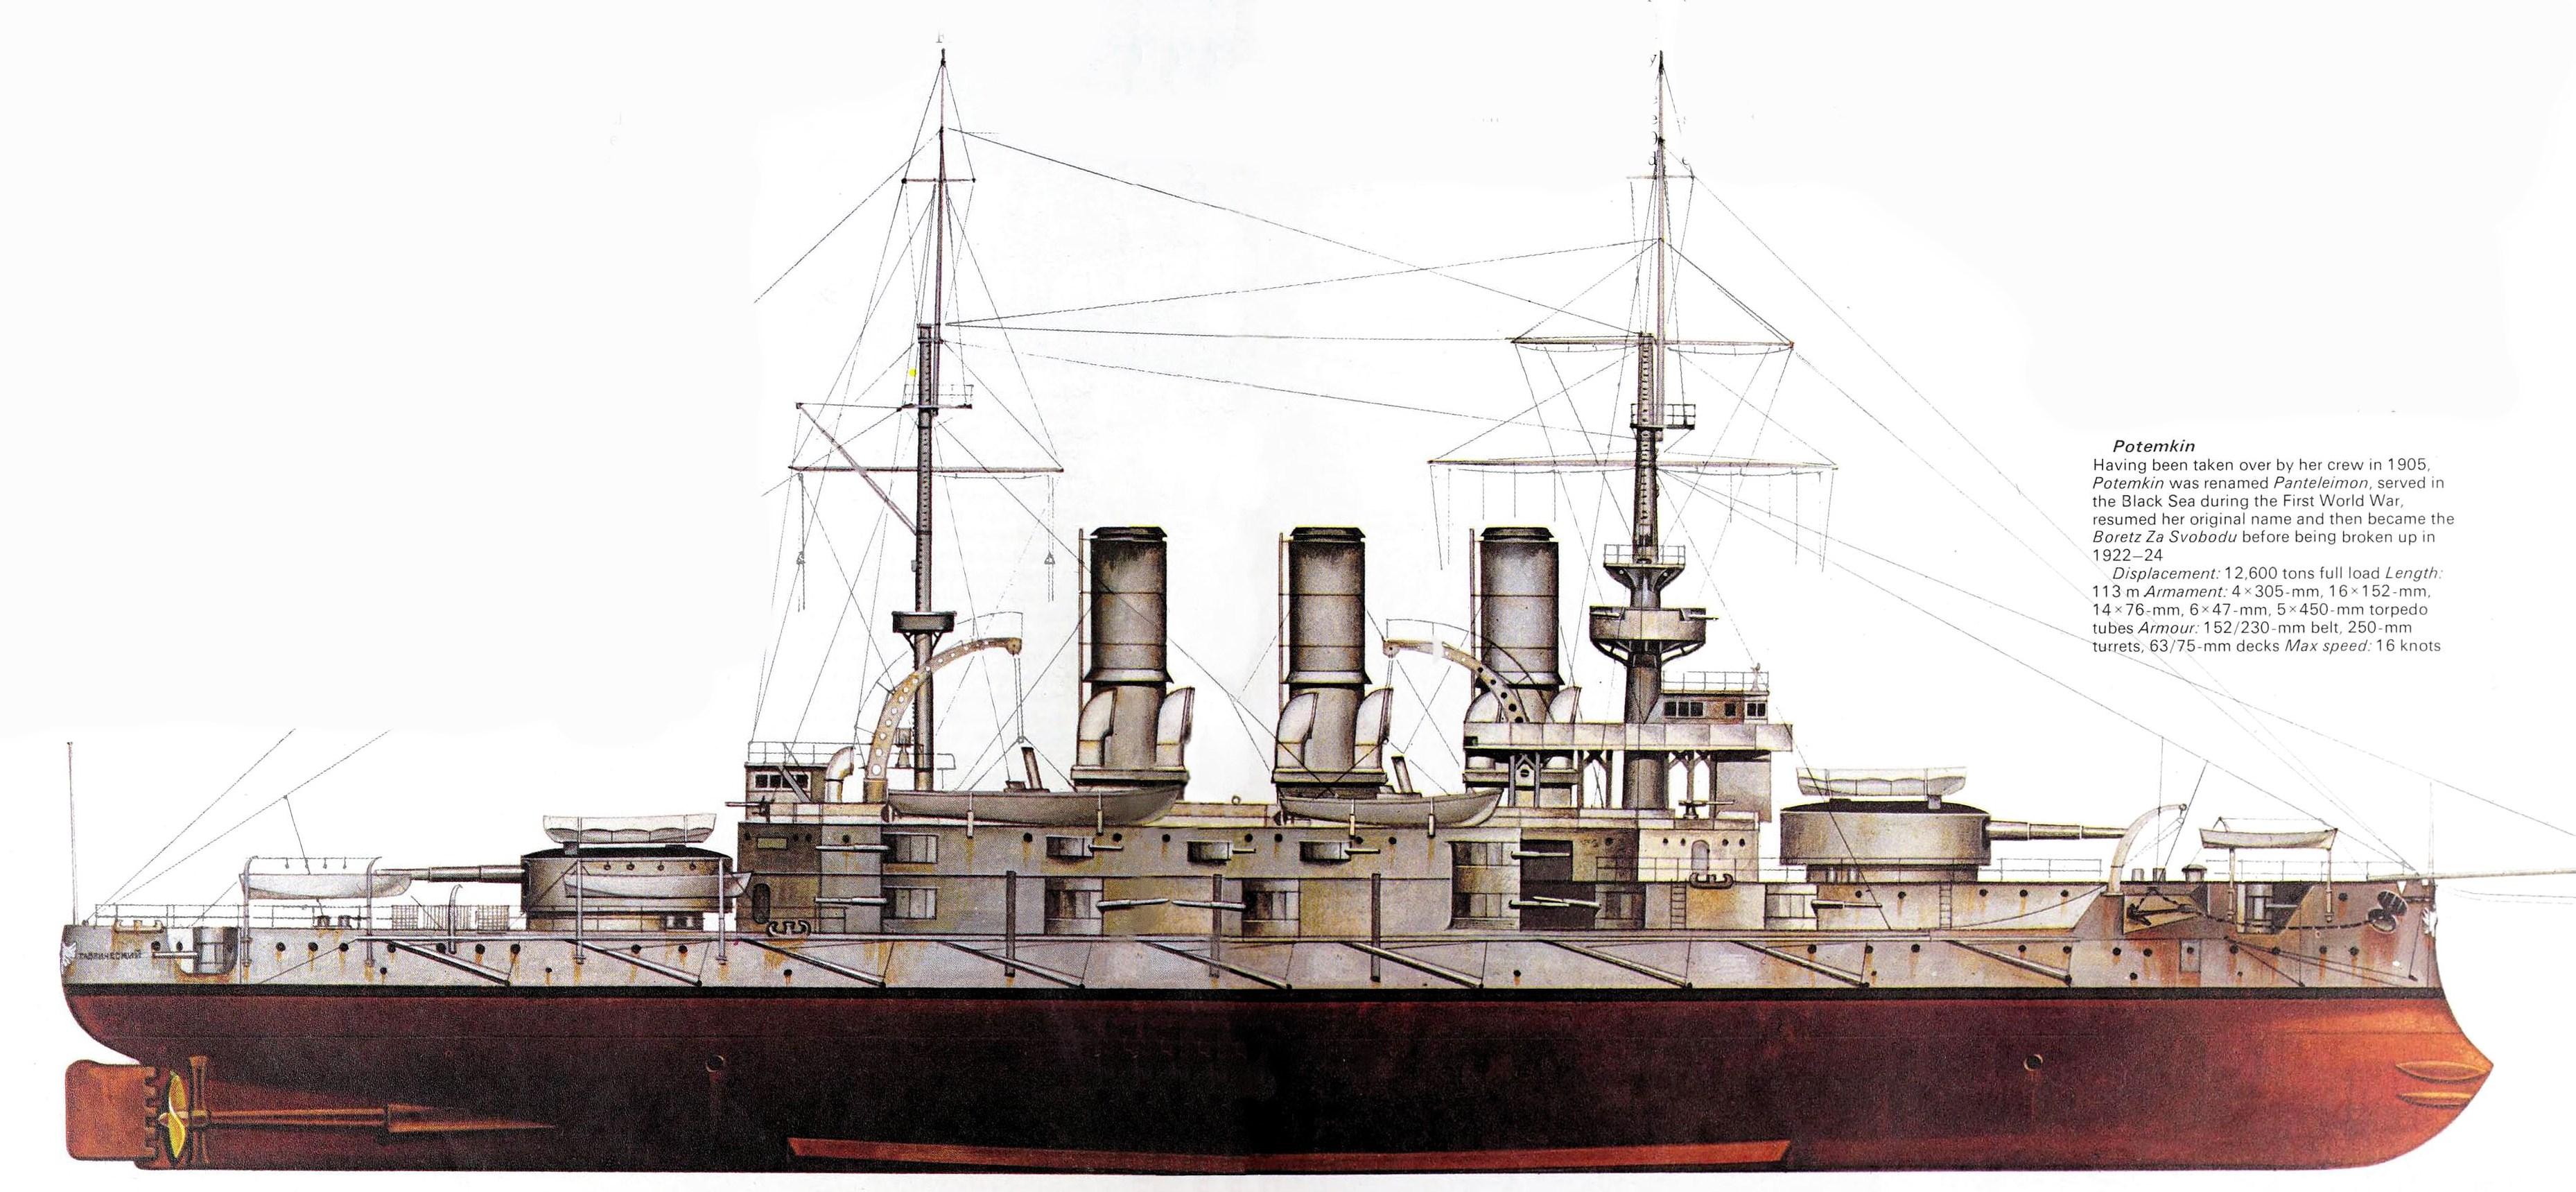 Mutiny on Potemkin 1905 june DIEULOIS